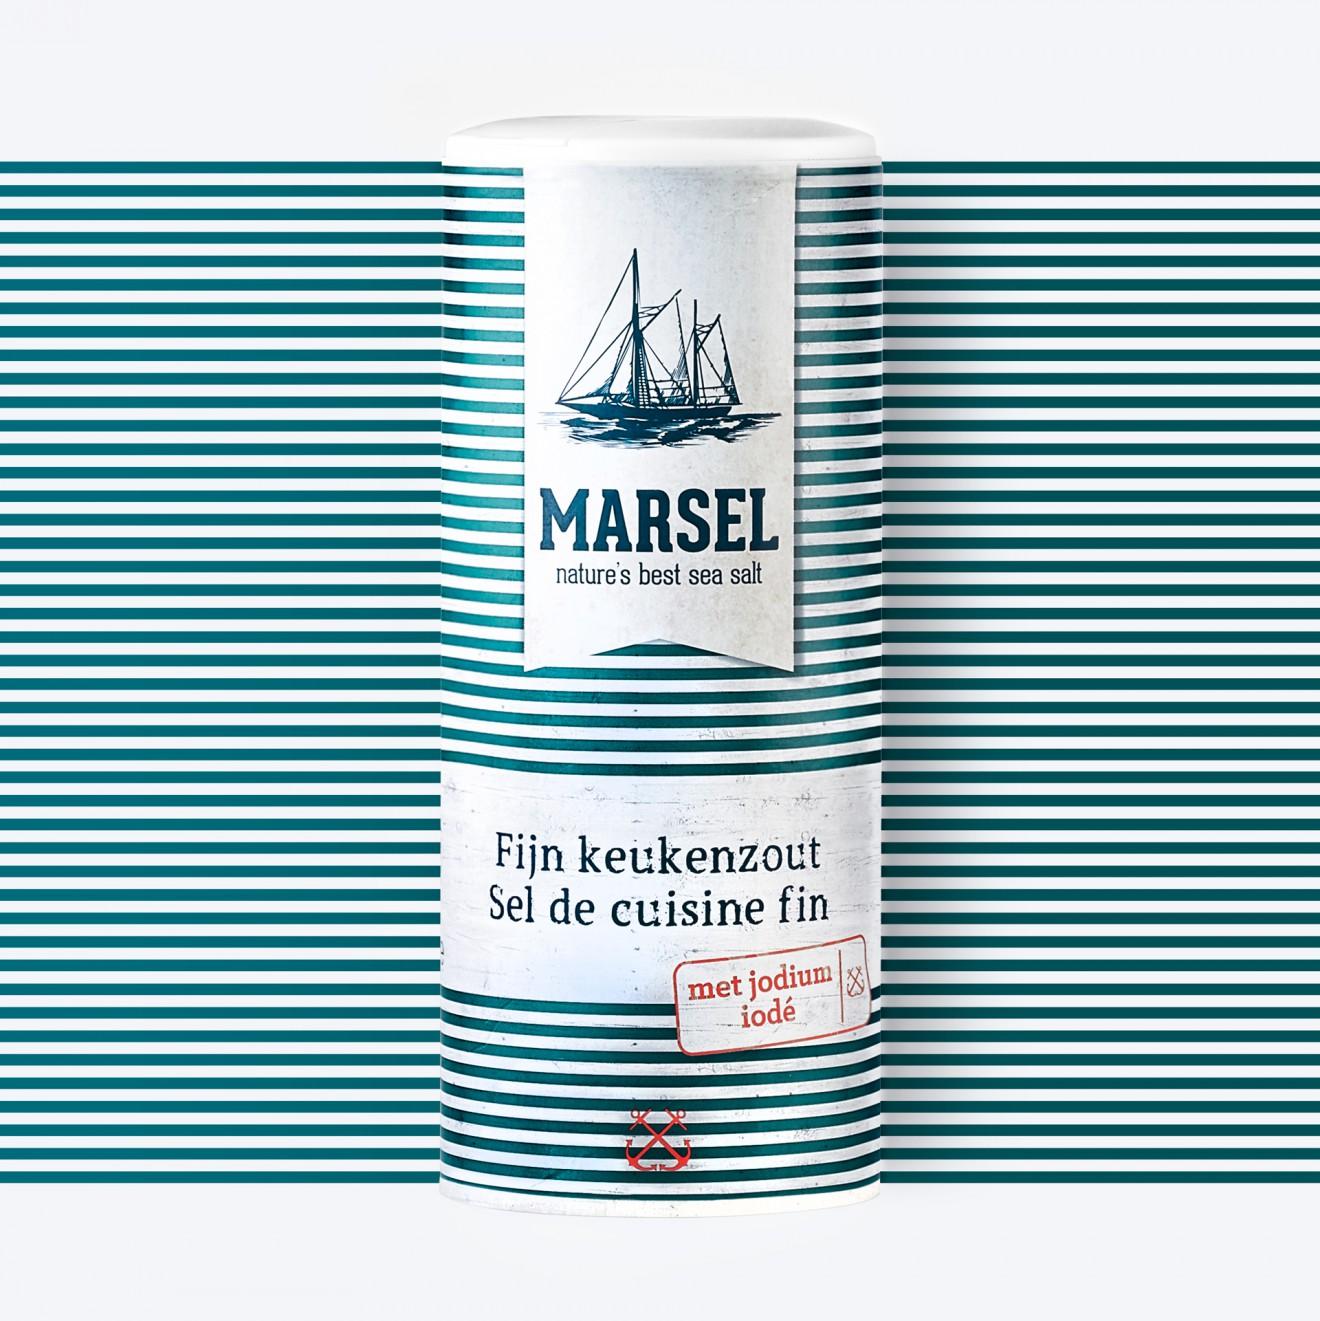 Quatre Mains package design - stripes, banner, salt